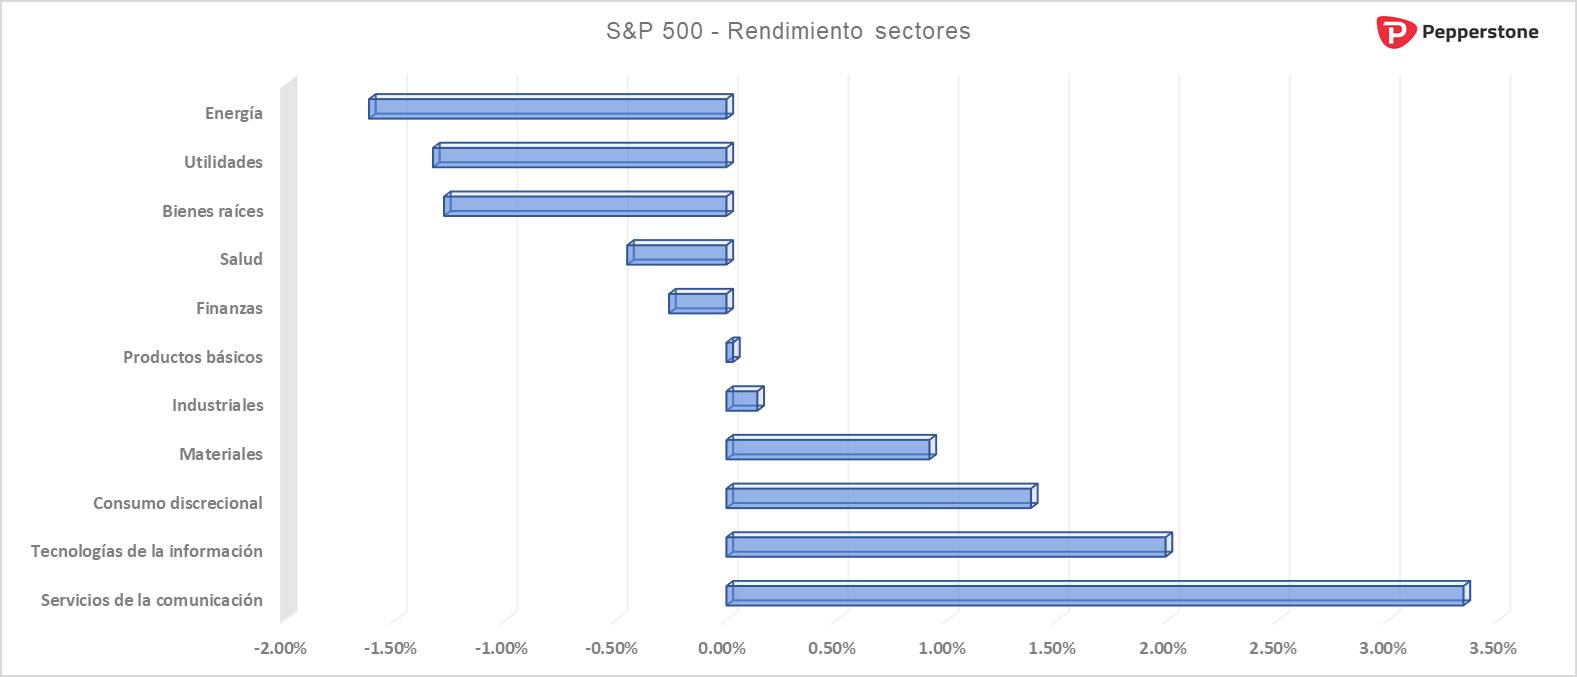 Rendimiento_sectores_sp500.png